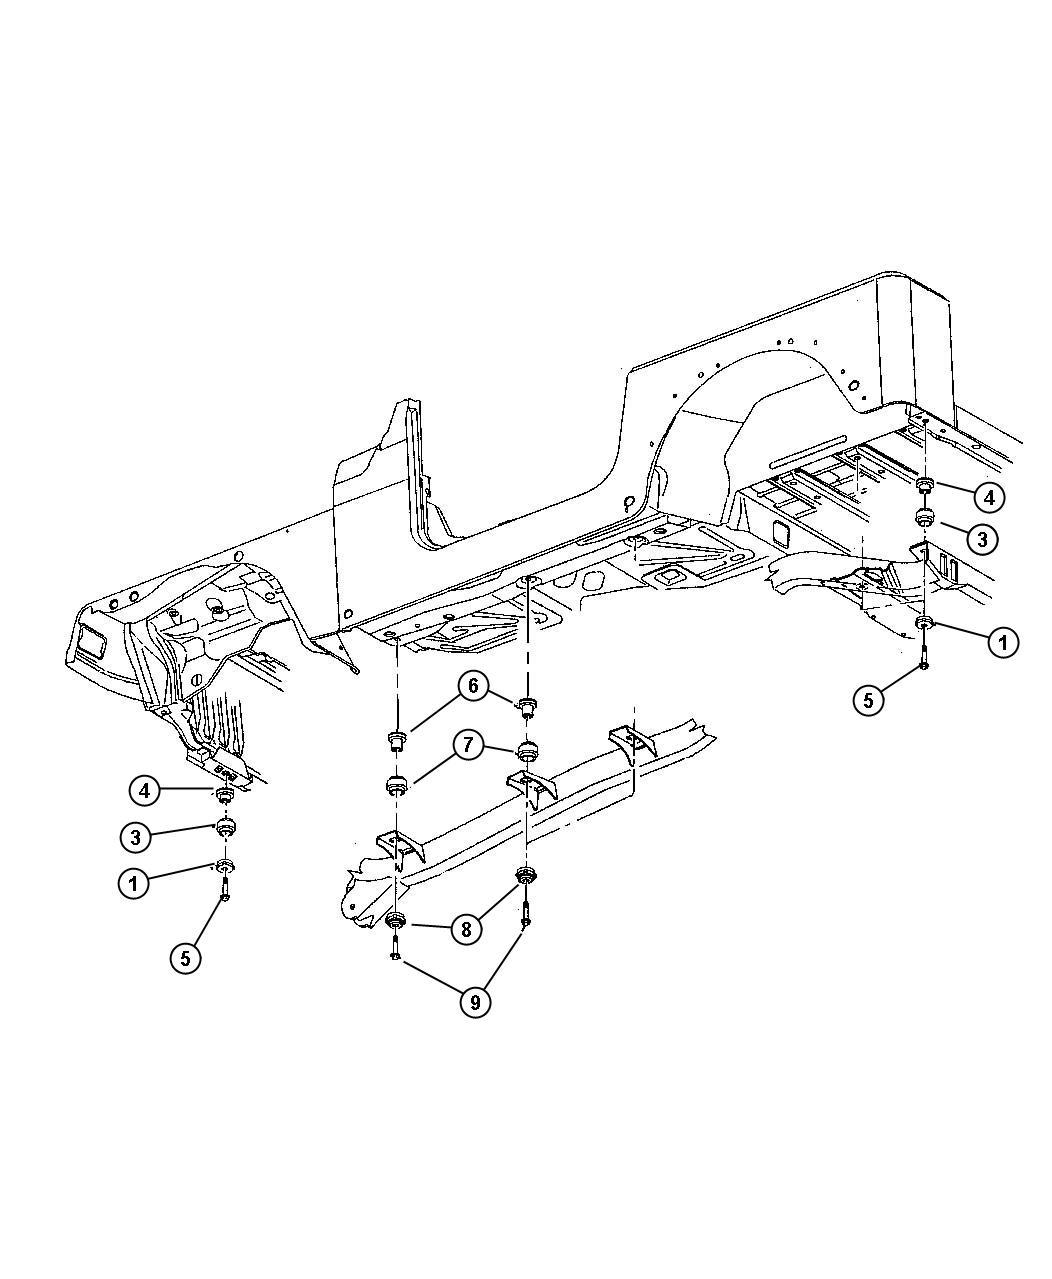 Jeep Wrangler Insulator Body Hold Down Upper Body